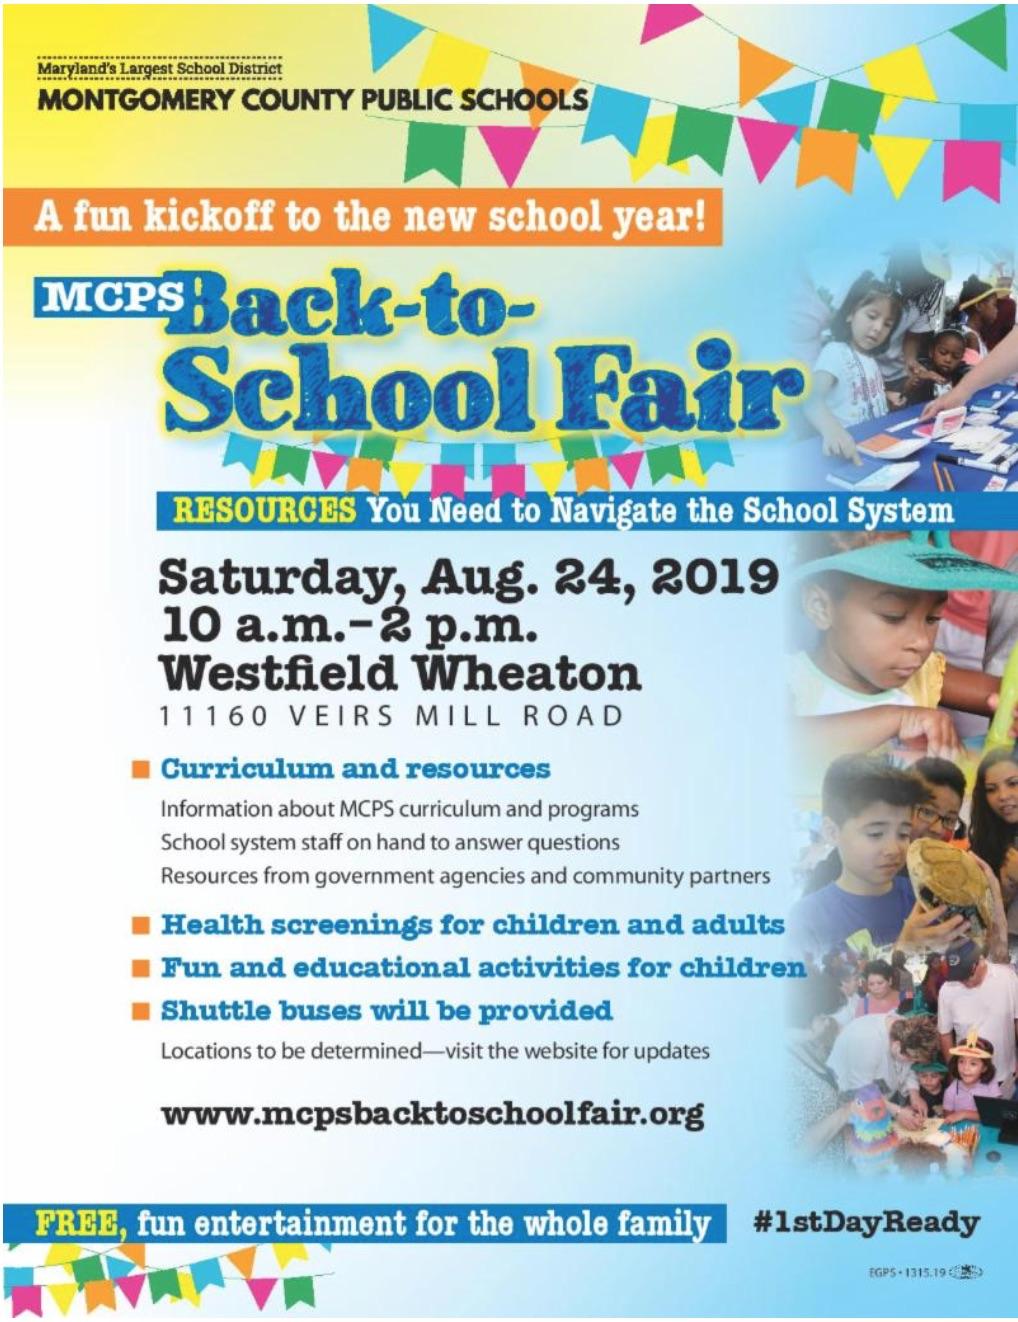 2019-08-24 MCPS Back to School Fair.jpg